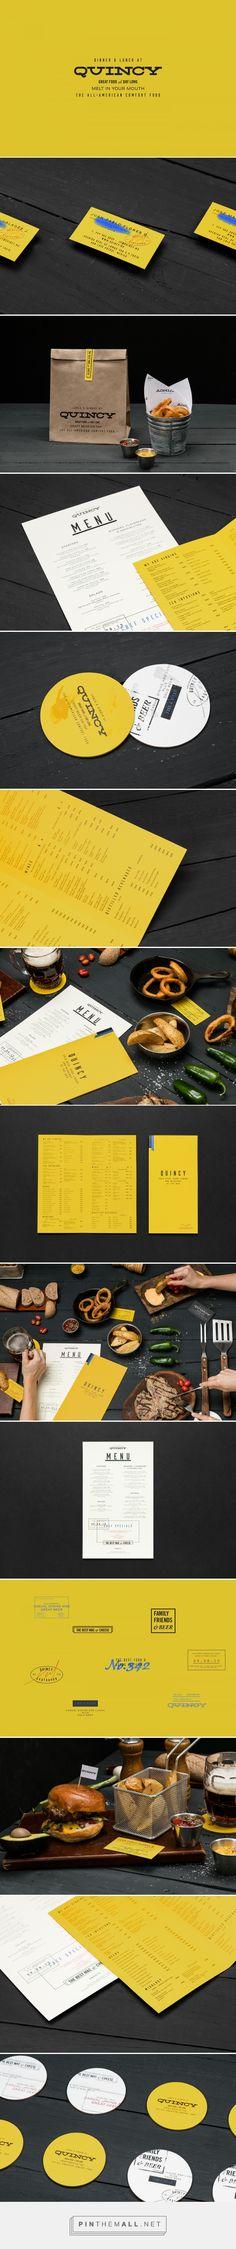 Quincy Restaurant Branding by Parametro Studio on Behance | Fivestar Branding – Design and Branding Agency & Inspiration Gallery